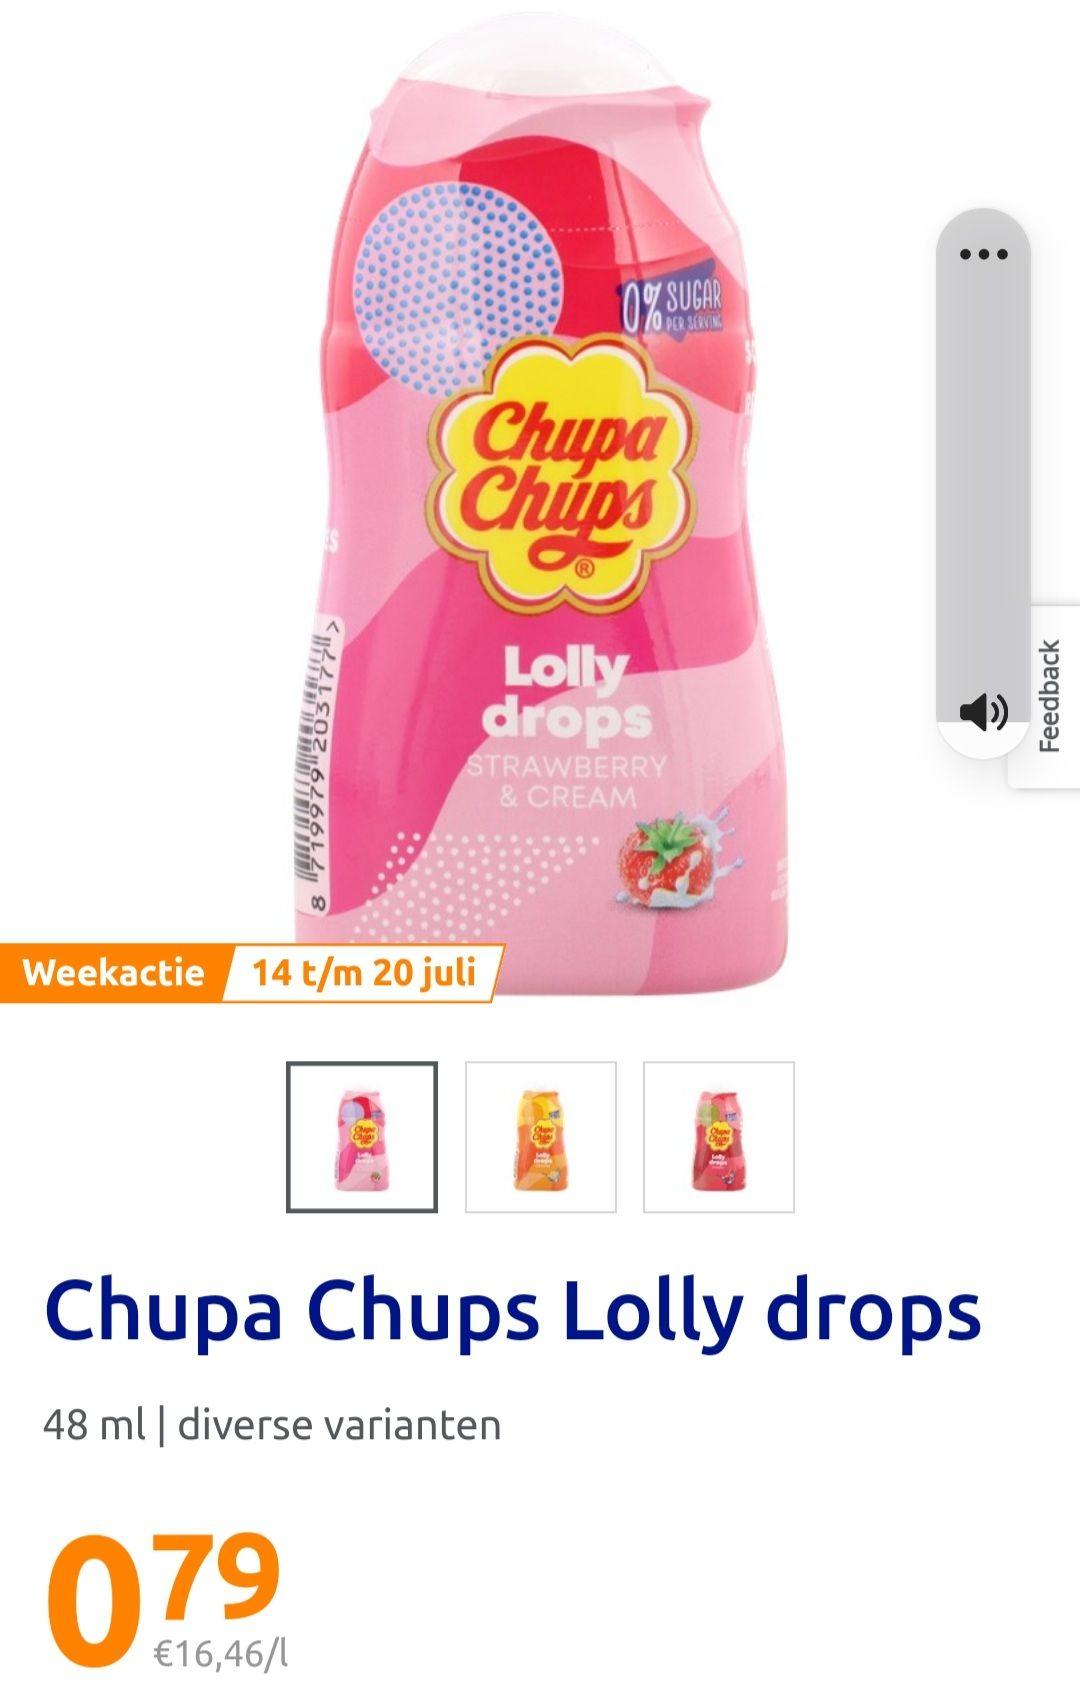 Chupa Chups lolly drops limonade @ Action